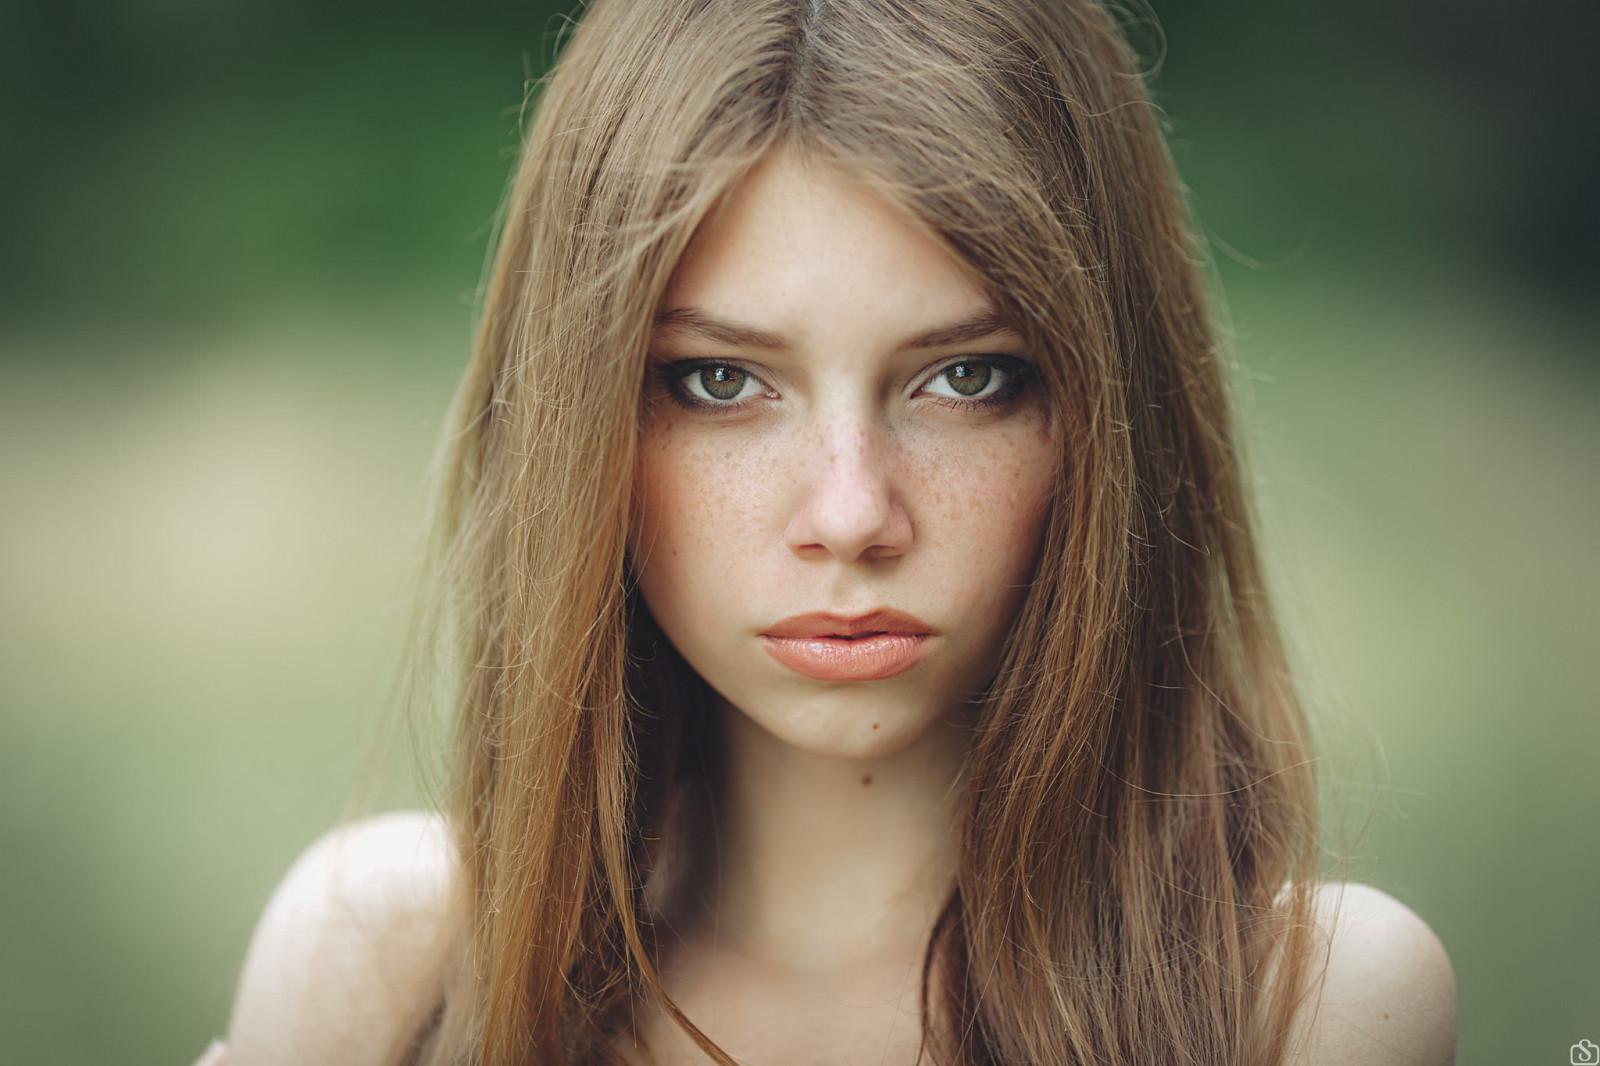 русские девушки фото фотомодели русые